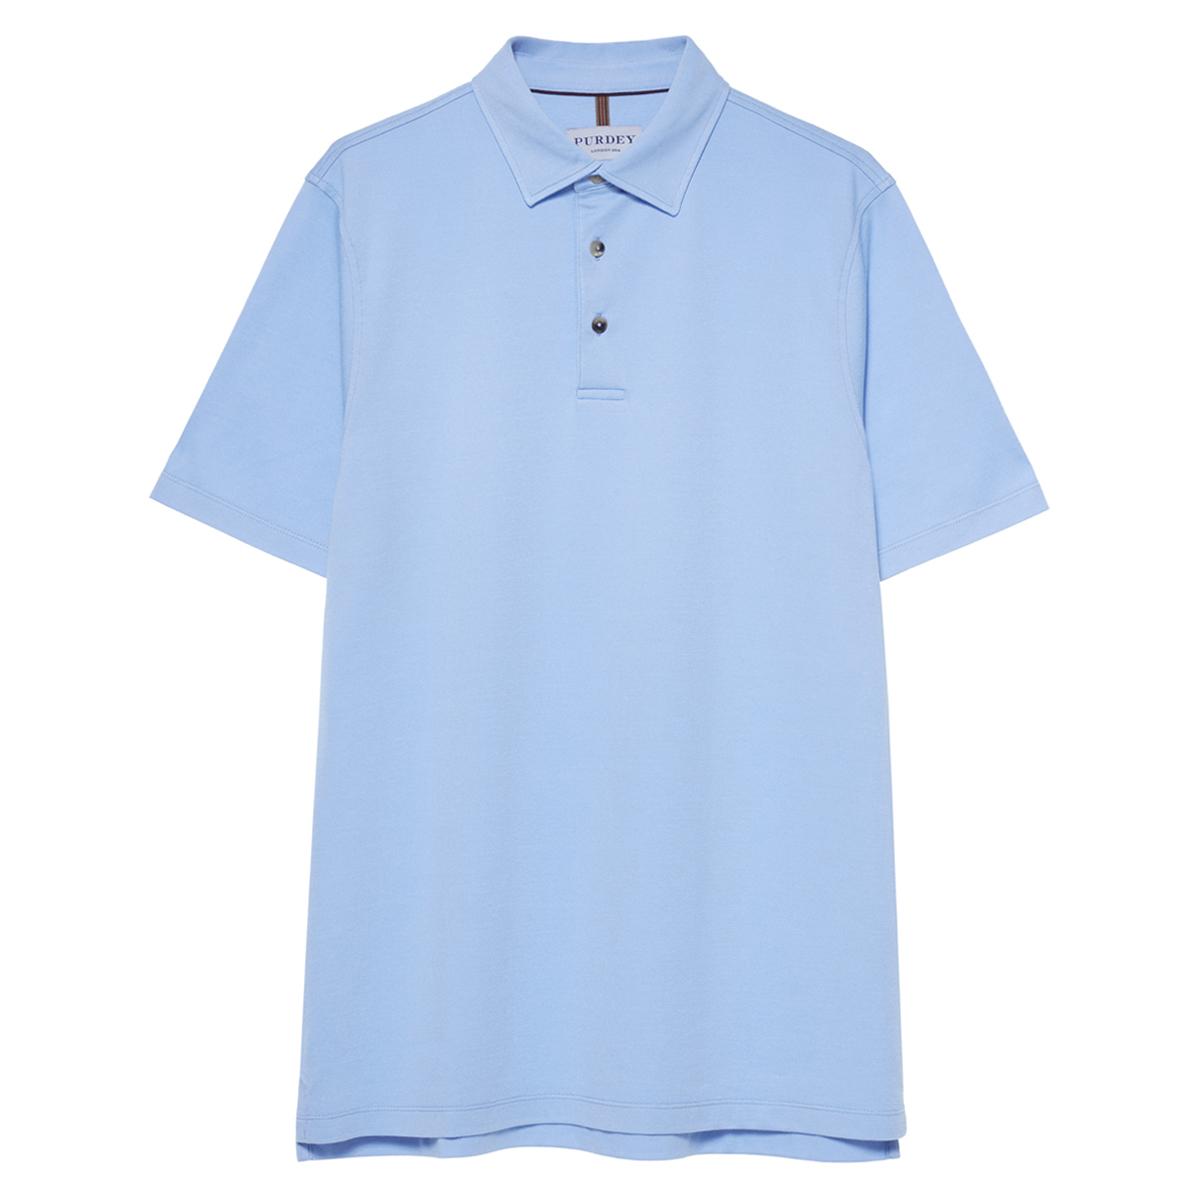 Light Blue Cotton Berkshire Polo Shirt